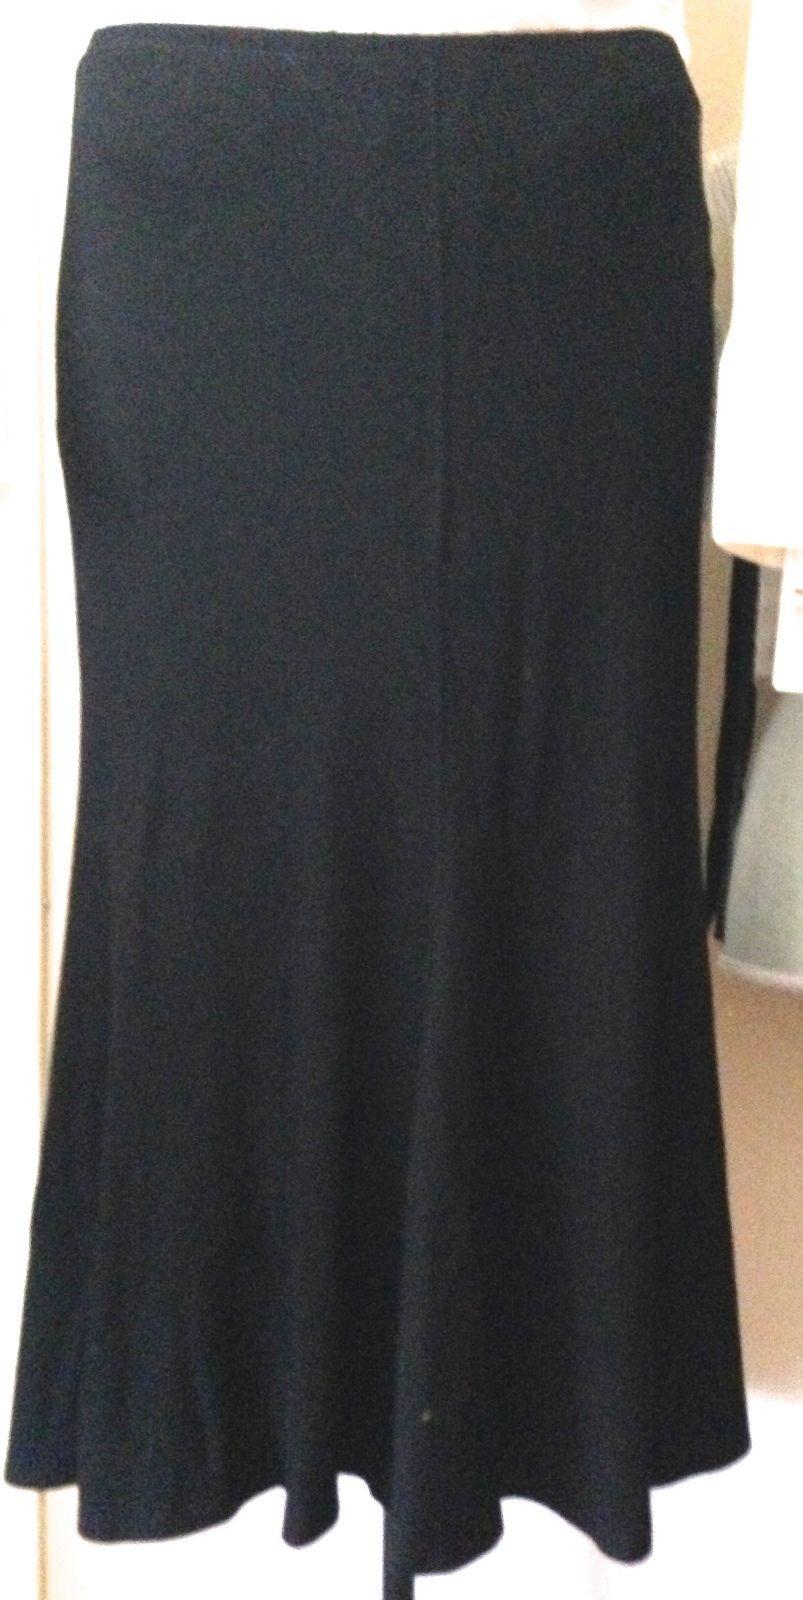 $995 DONNA KARAN black label collection  jersey spandex skirt M - $269.00